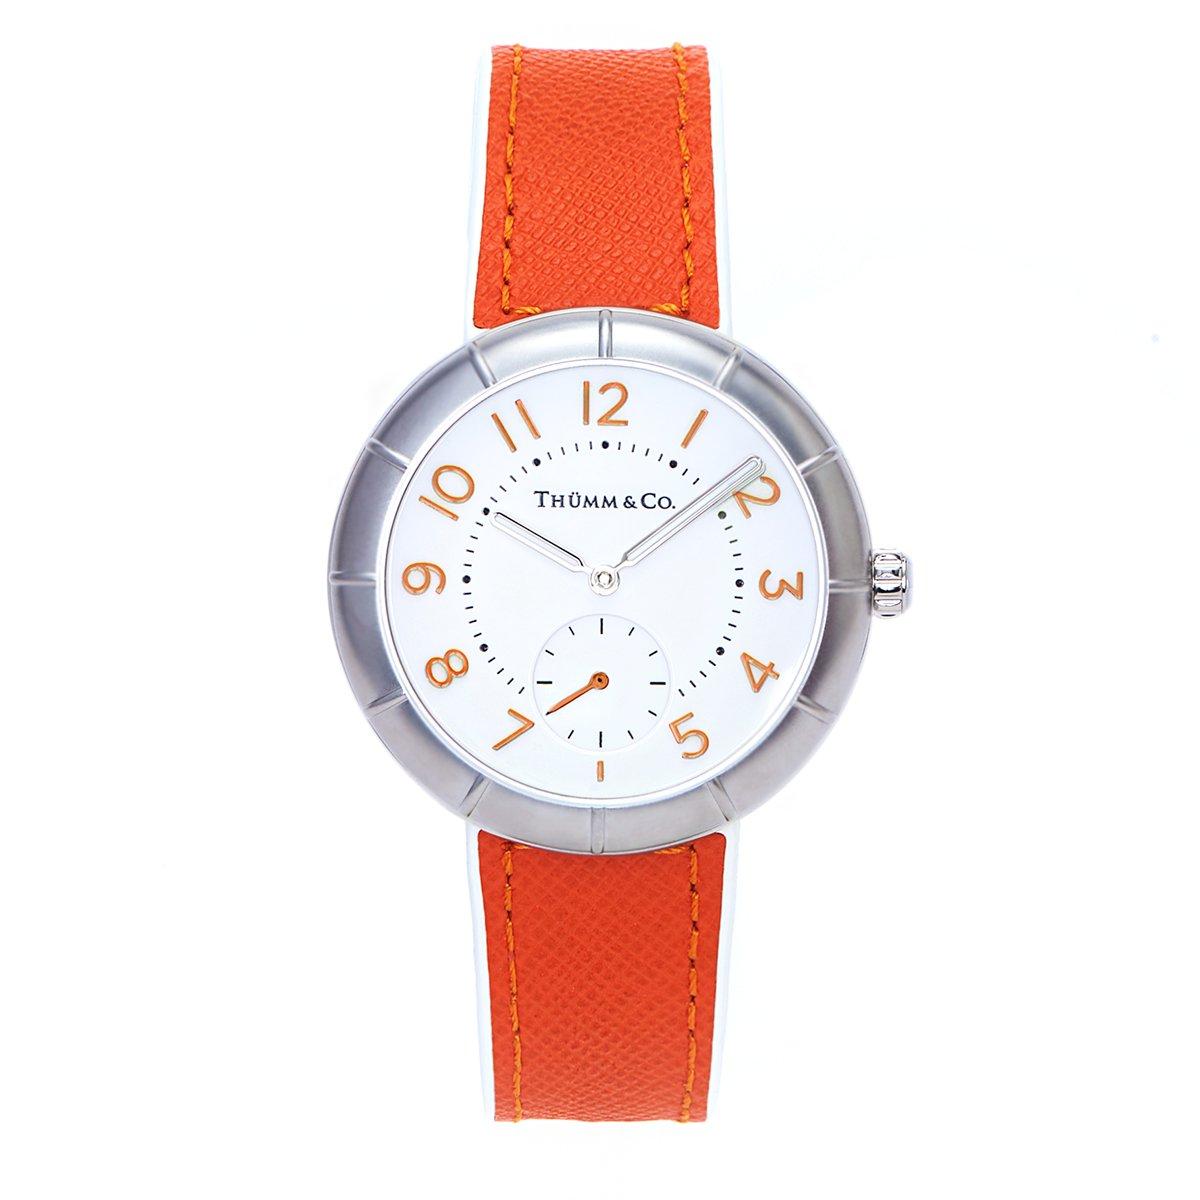 Thumm Co Vesta Watch 1